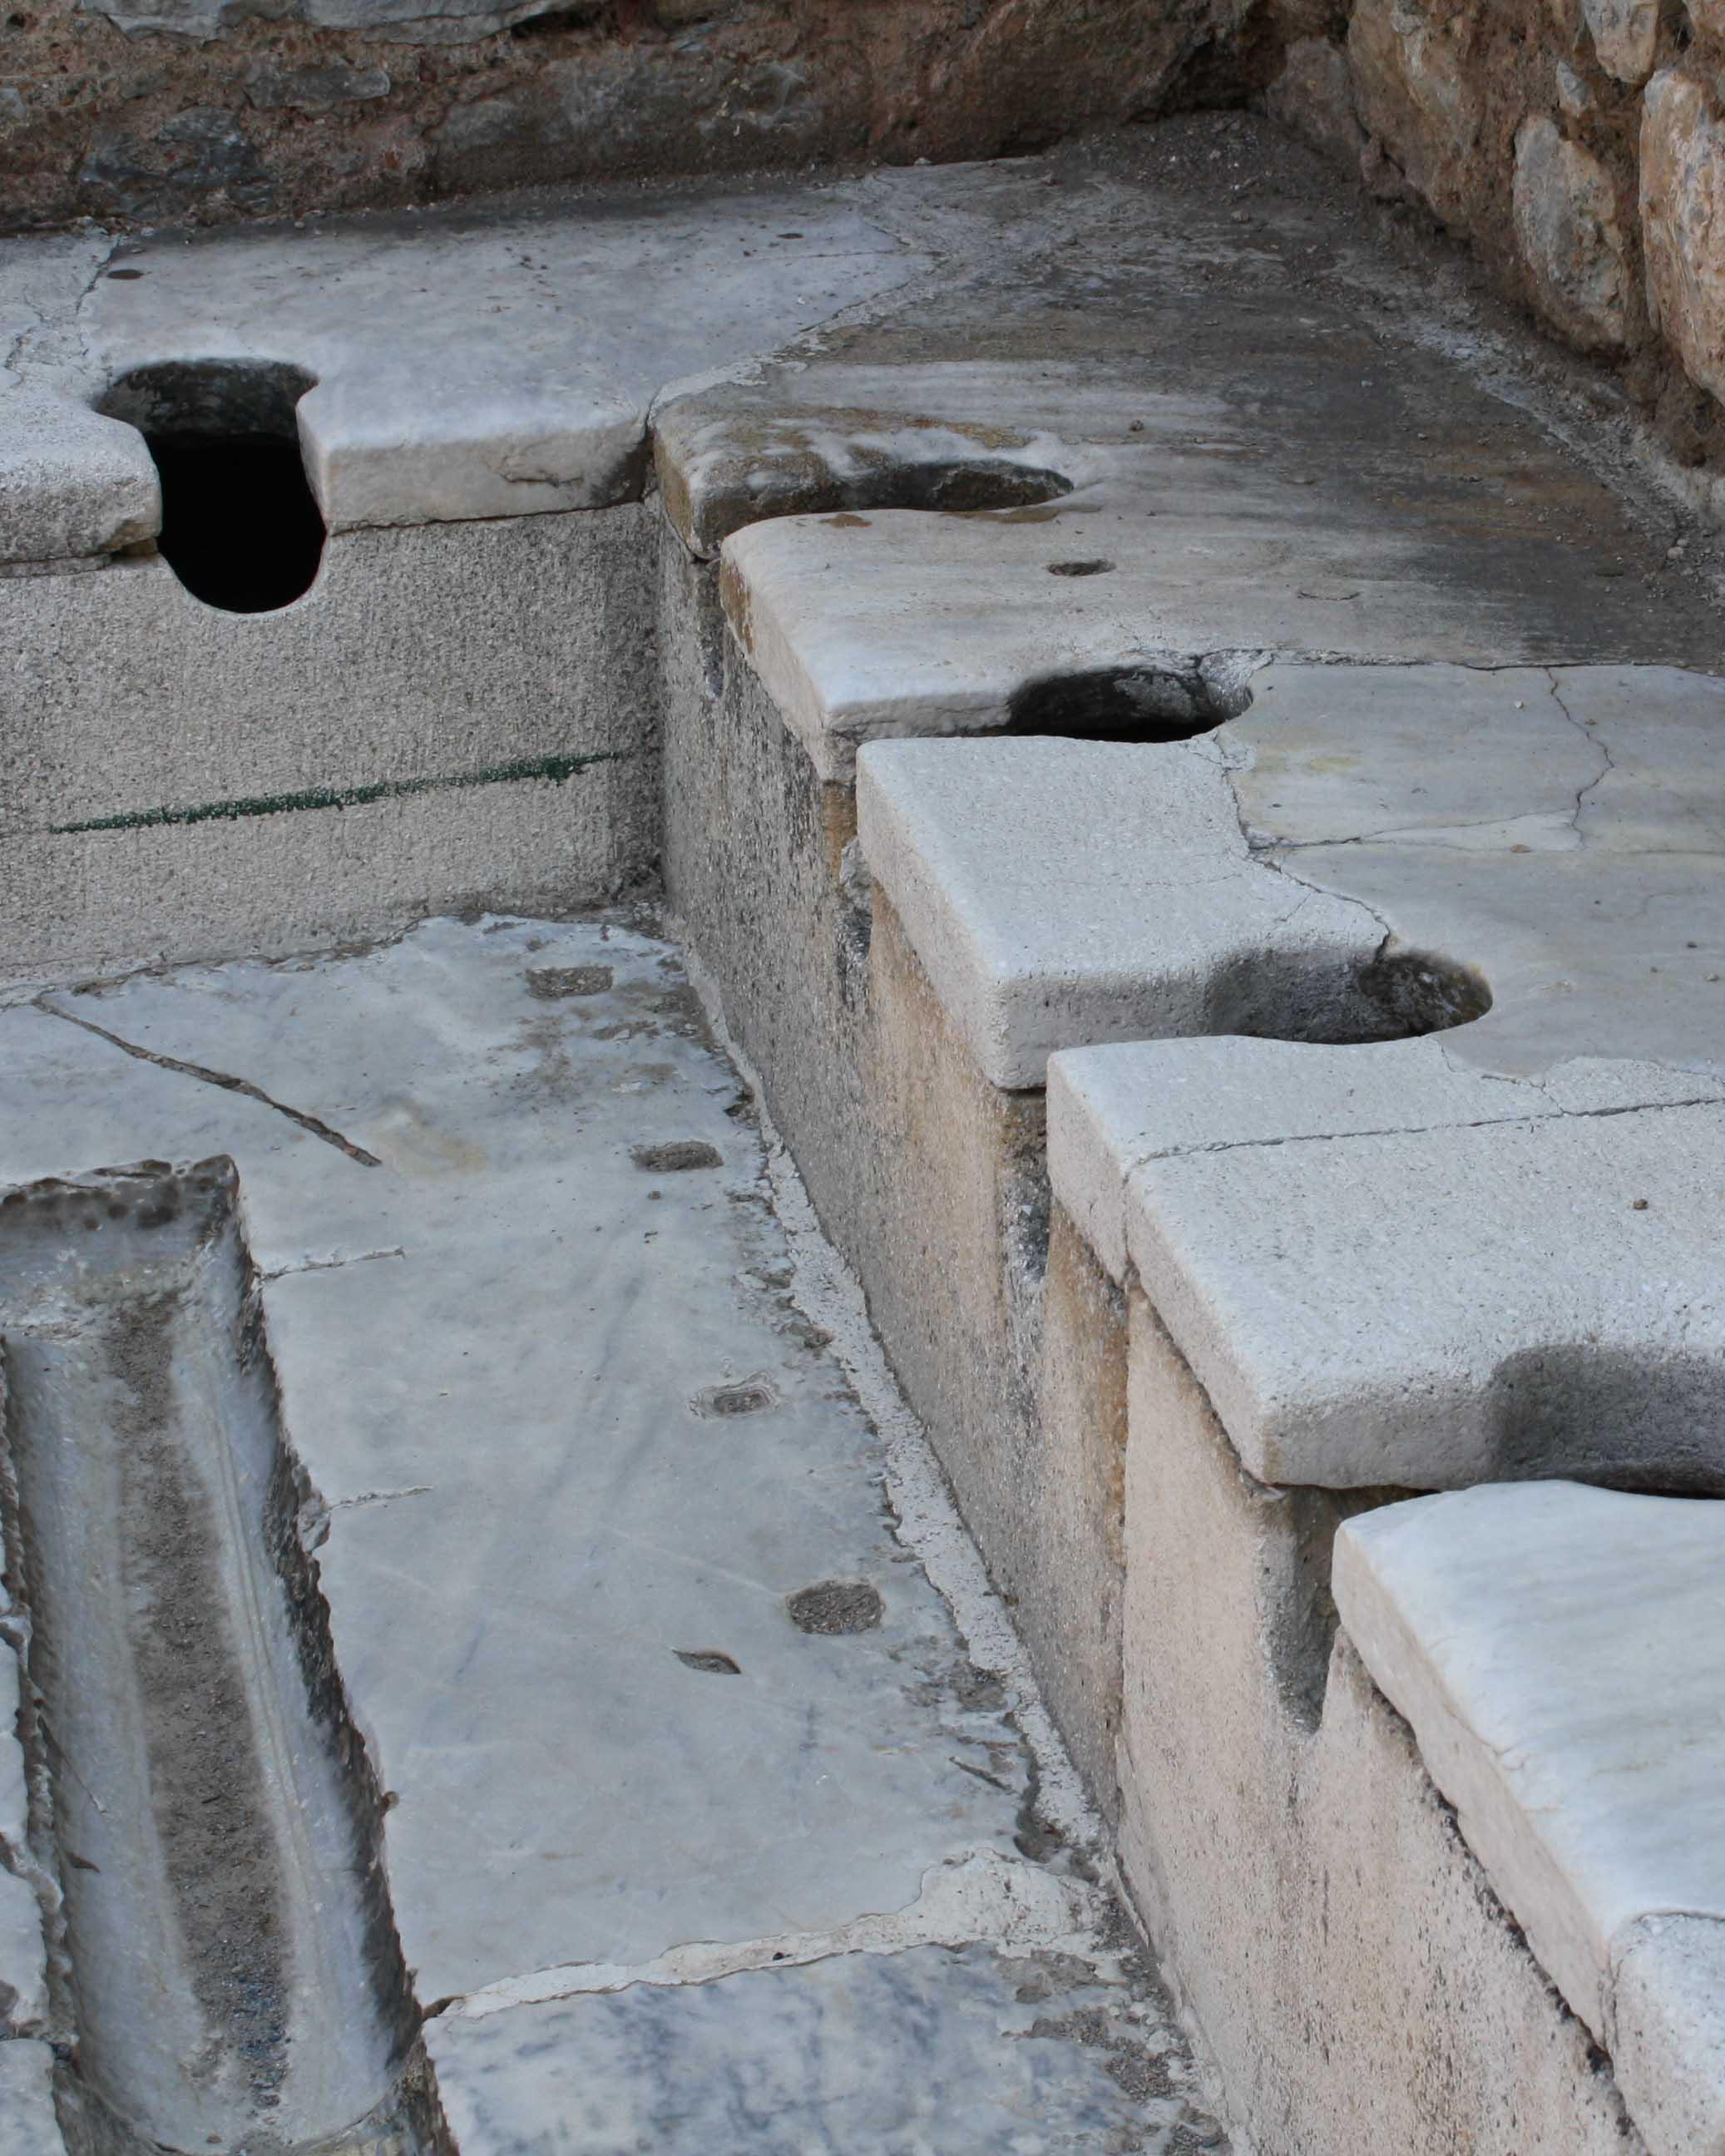 Photo: Ali Mert Özgün /Photography Tour Guide - Public toilets (latrines) of Ephesus